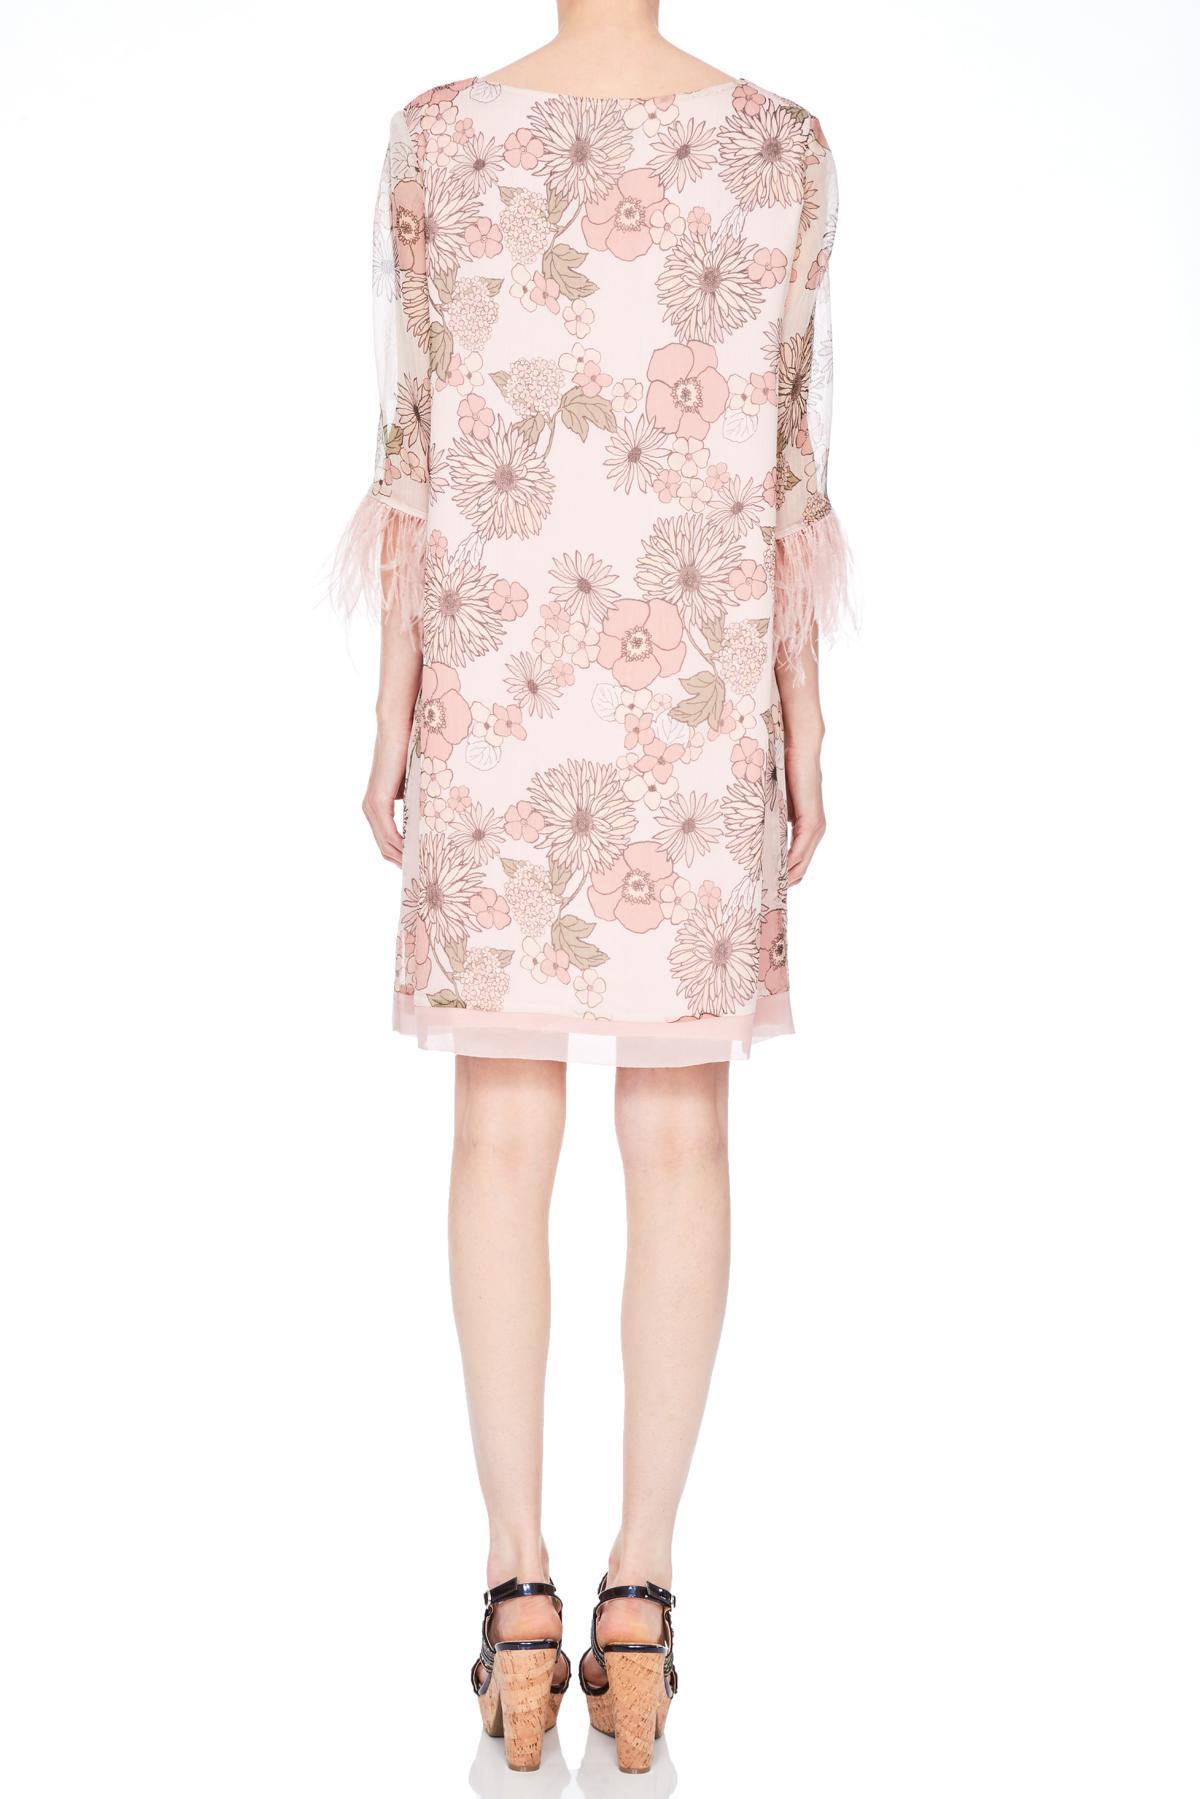 Rear view of Ana Alcazar Feather Silk Dress Naris  worn by model